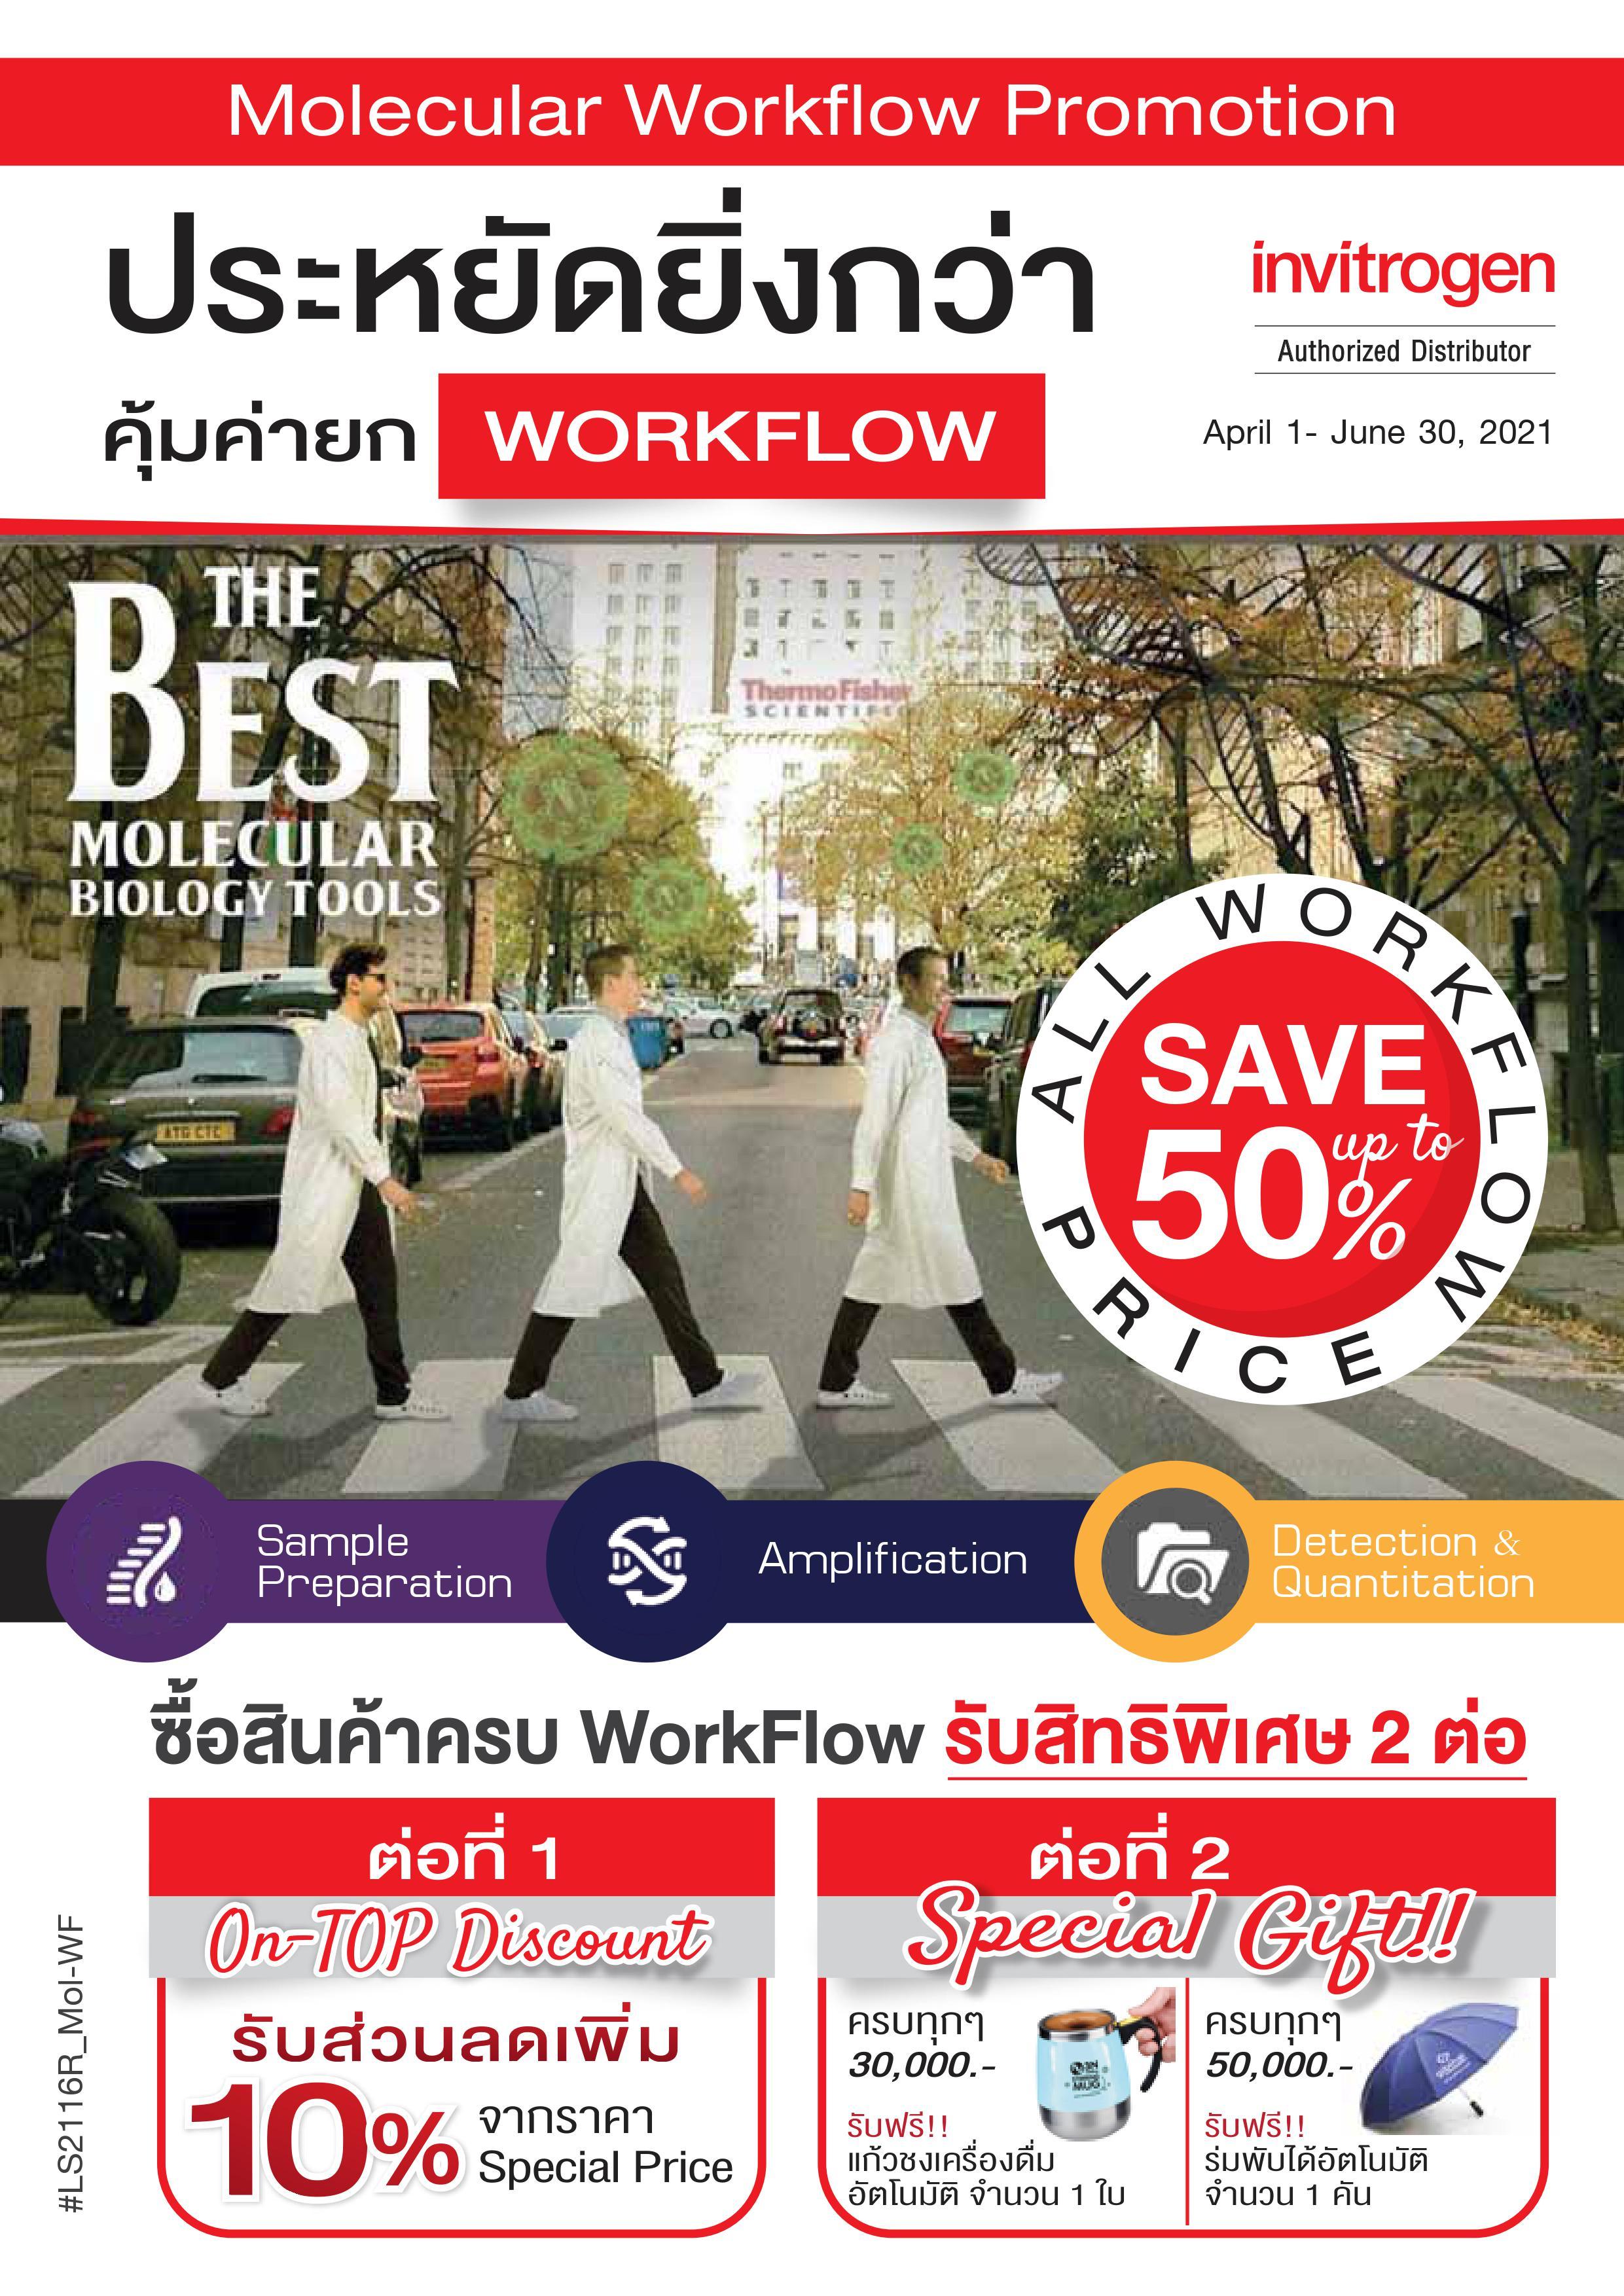 Molecular Workflow Promotion